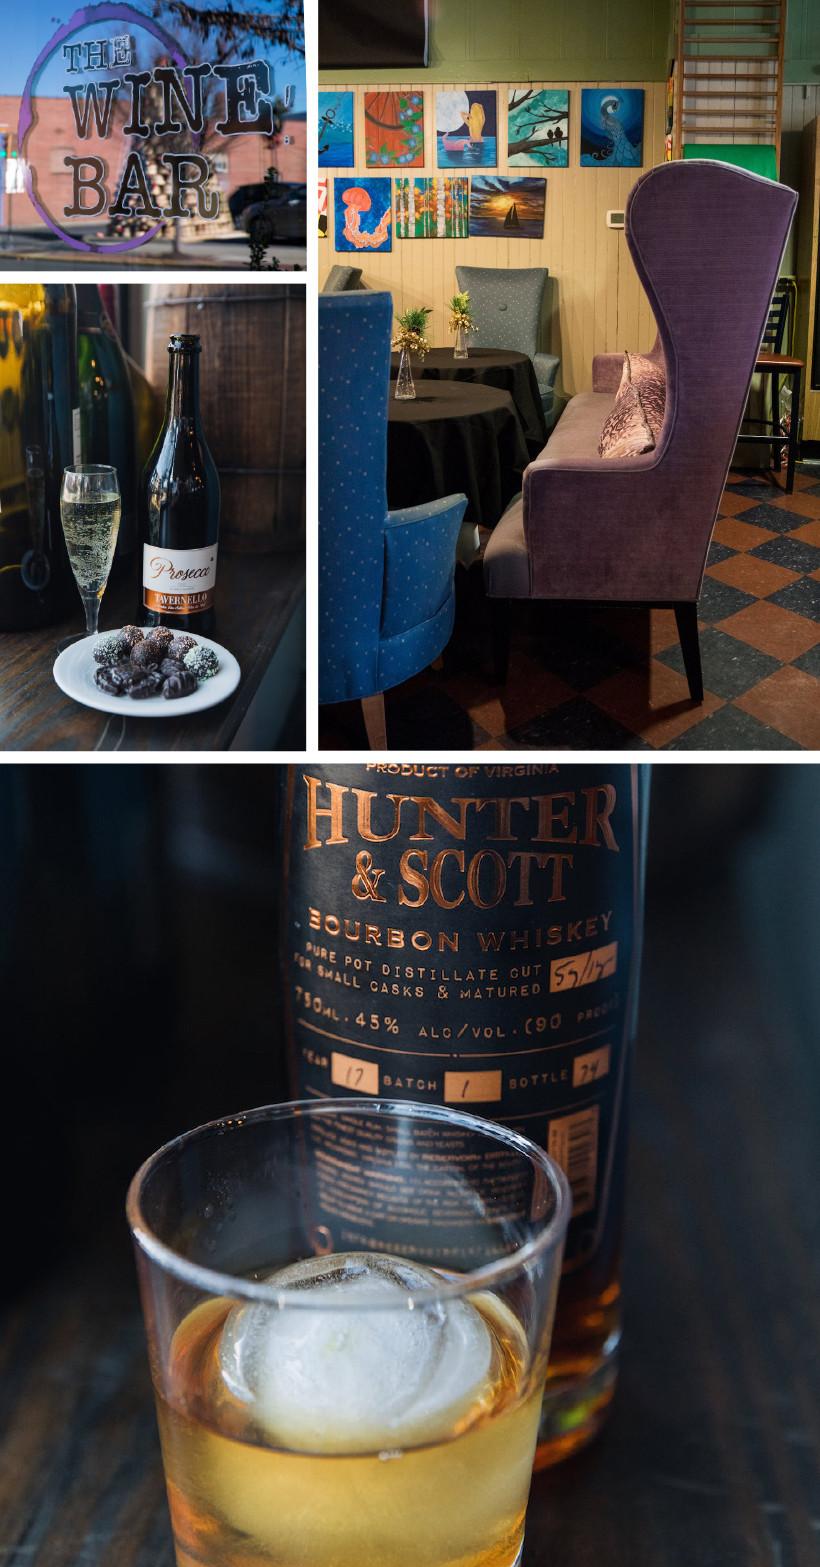 The Wine Bar in Cambridge